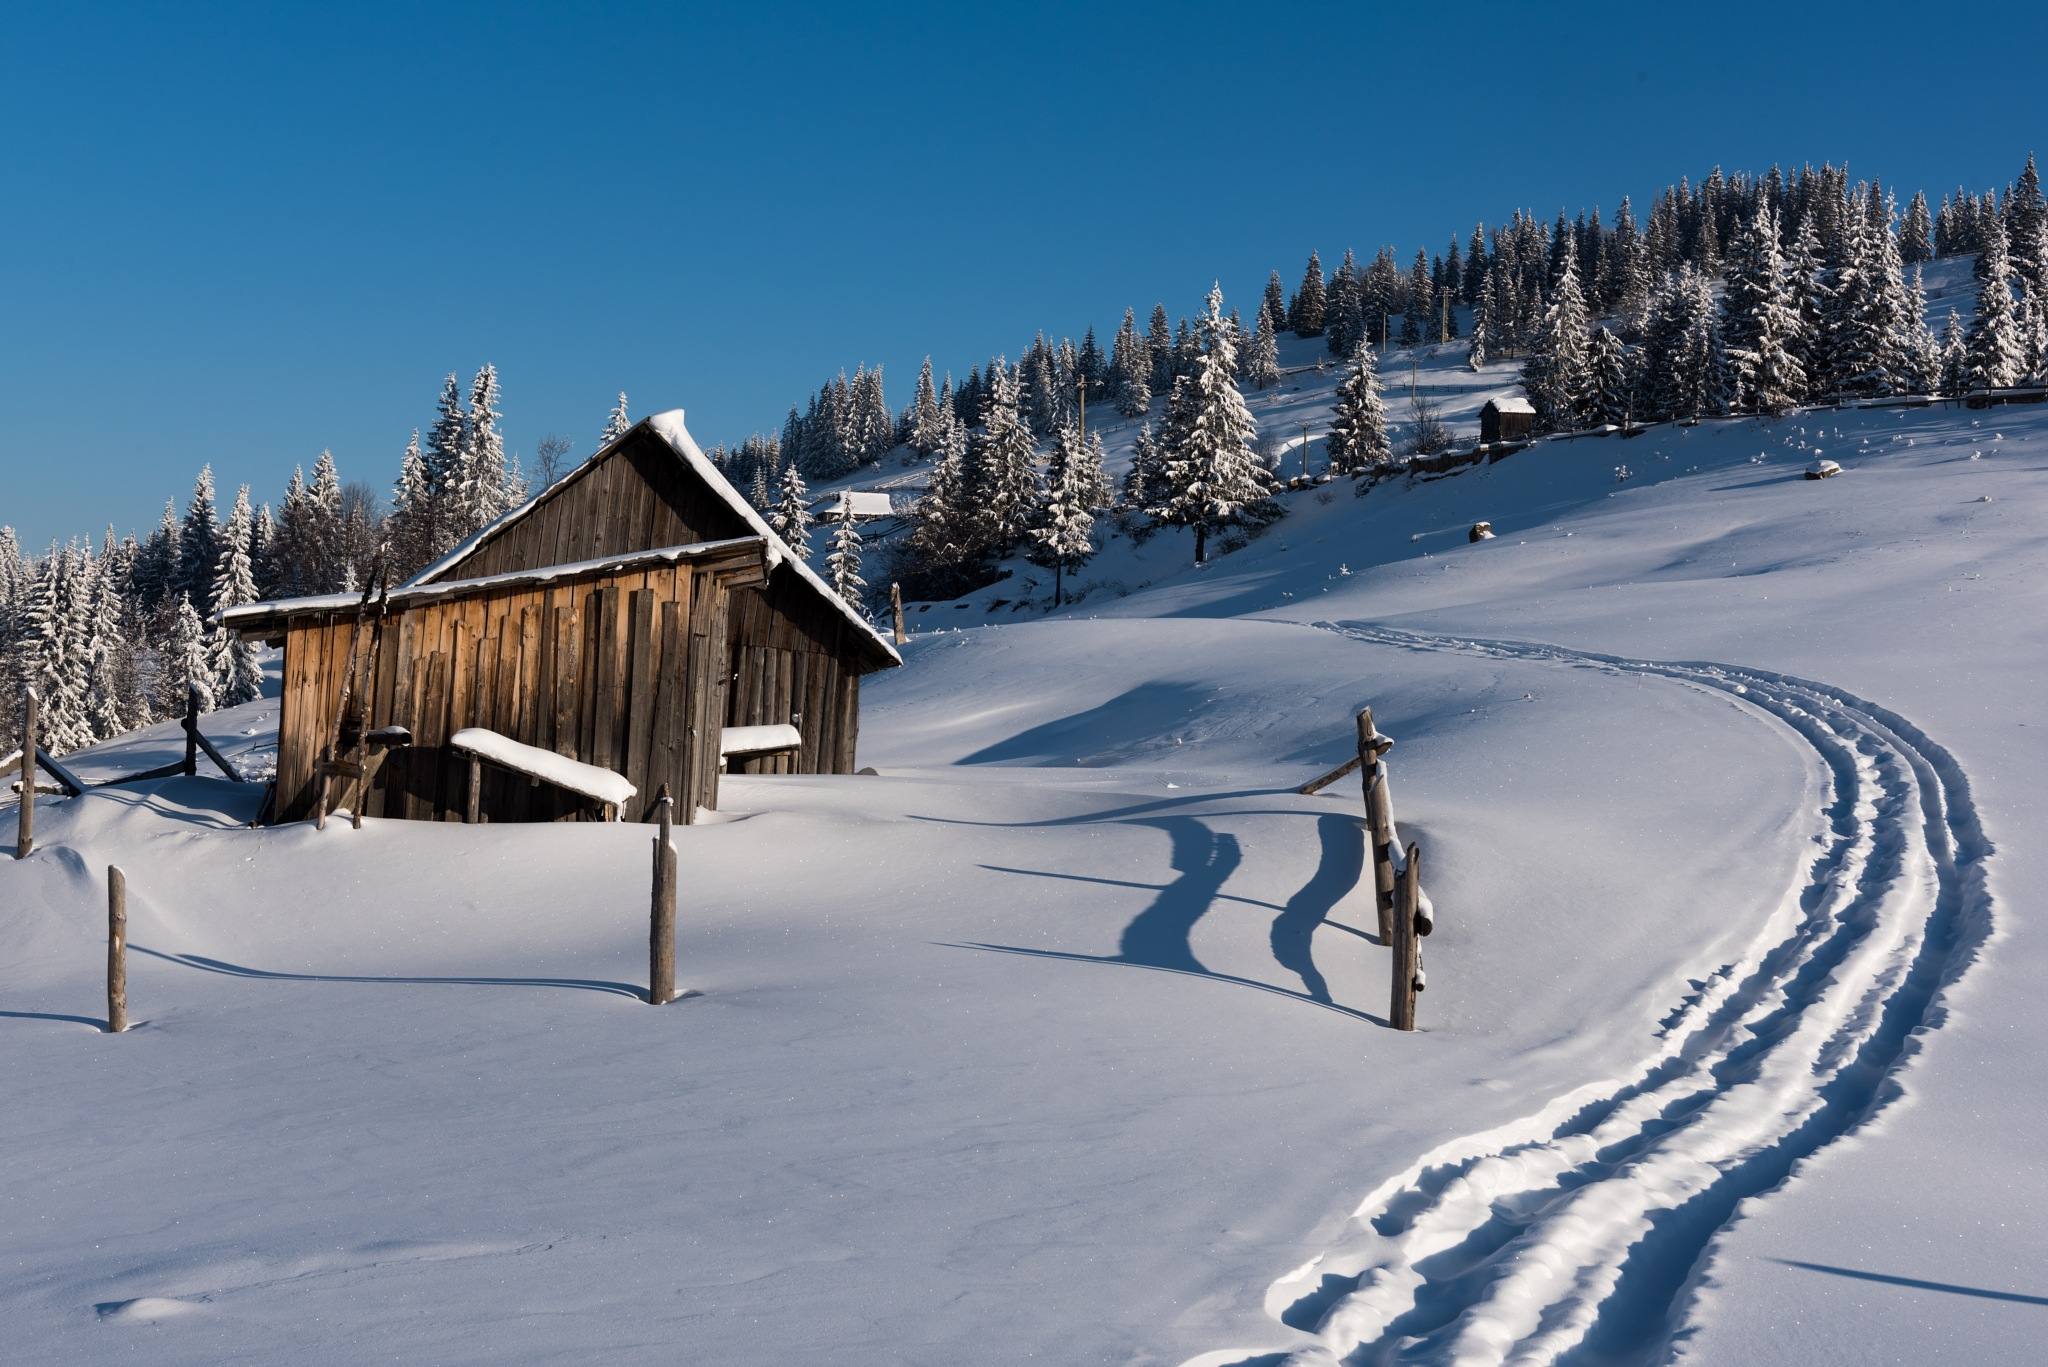 Tracks in the snow by MarkLanham